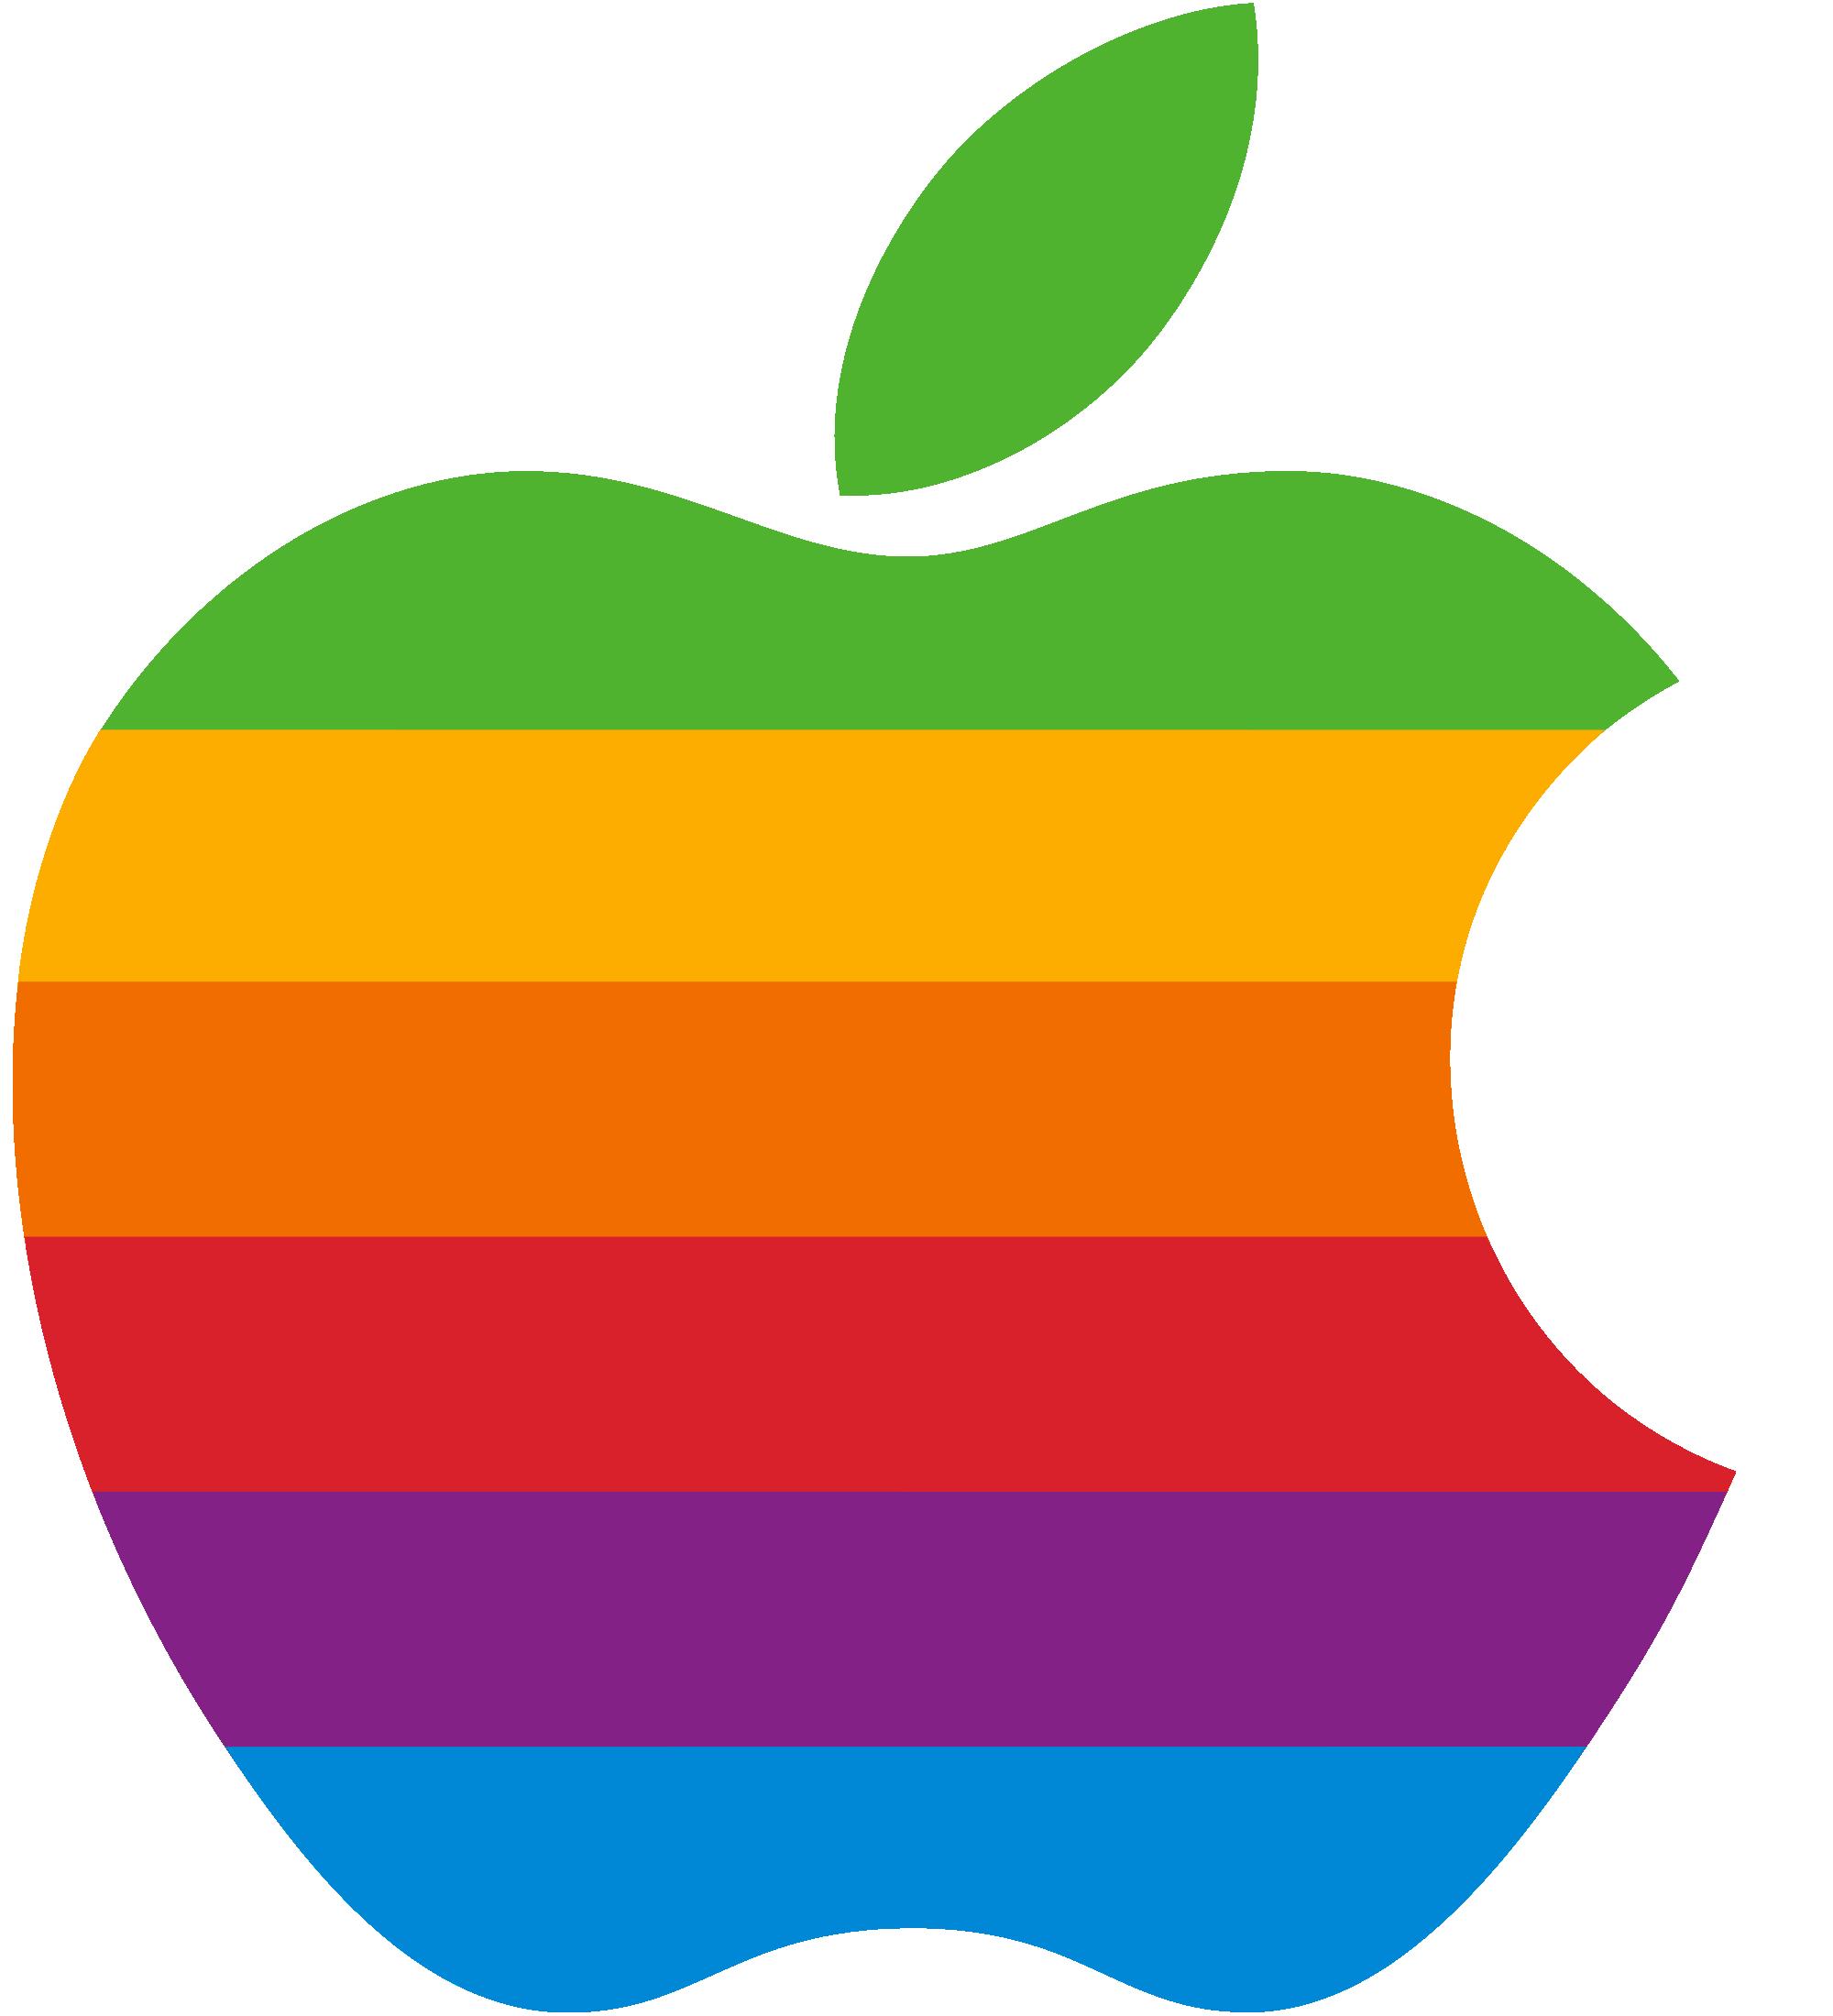 rainbow-apple-logo.png&f=1&nofb=1